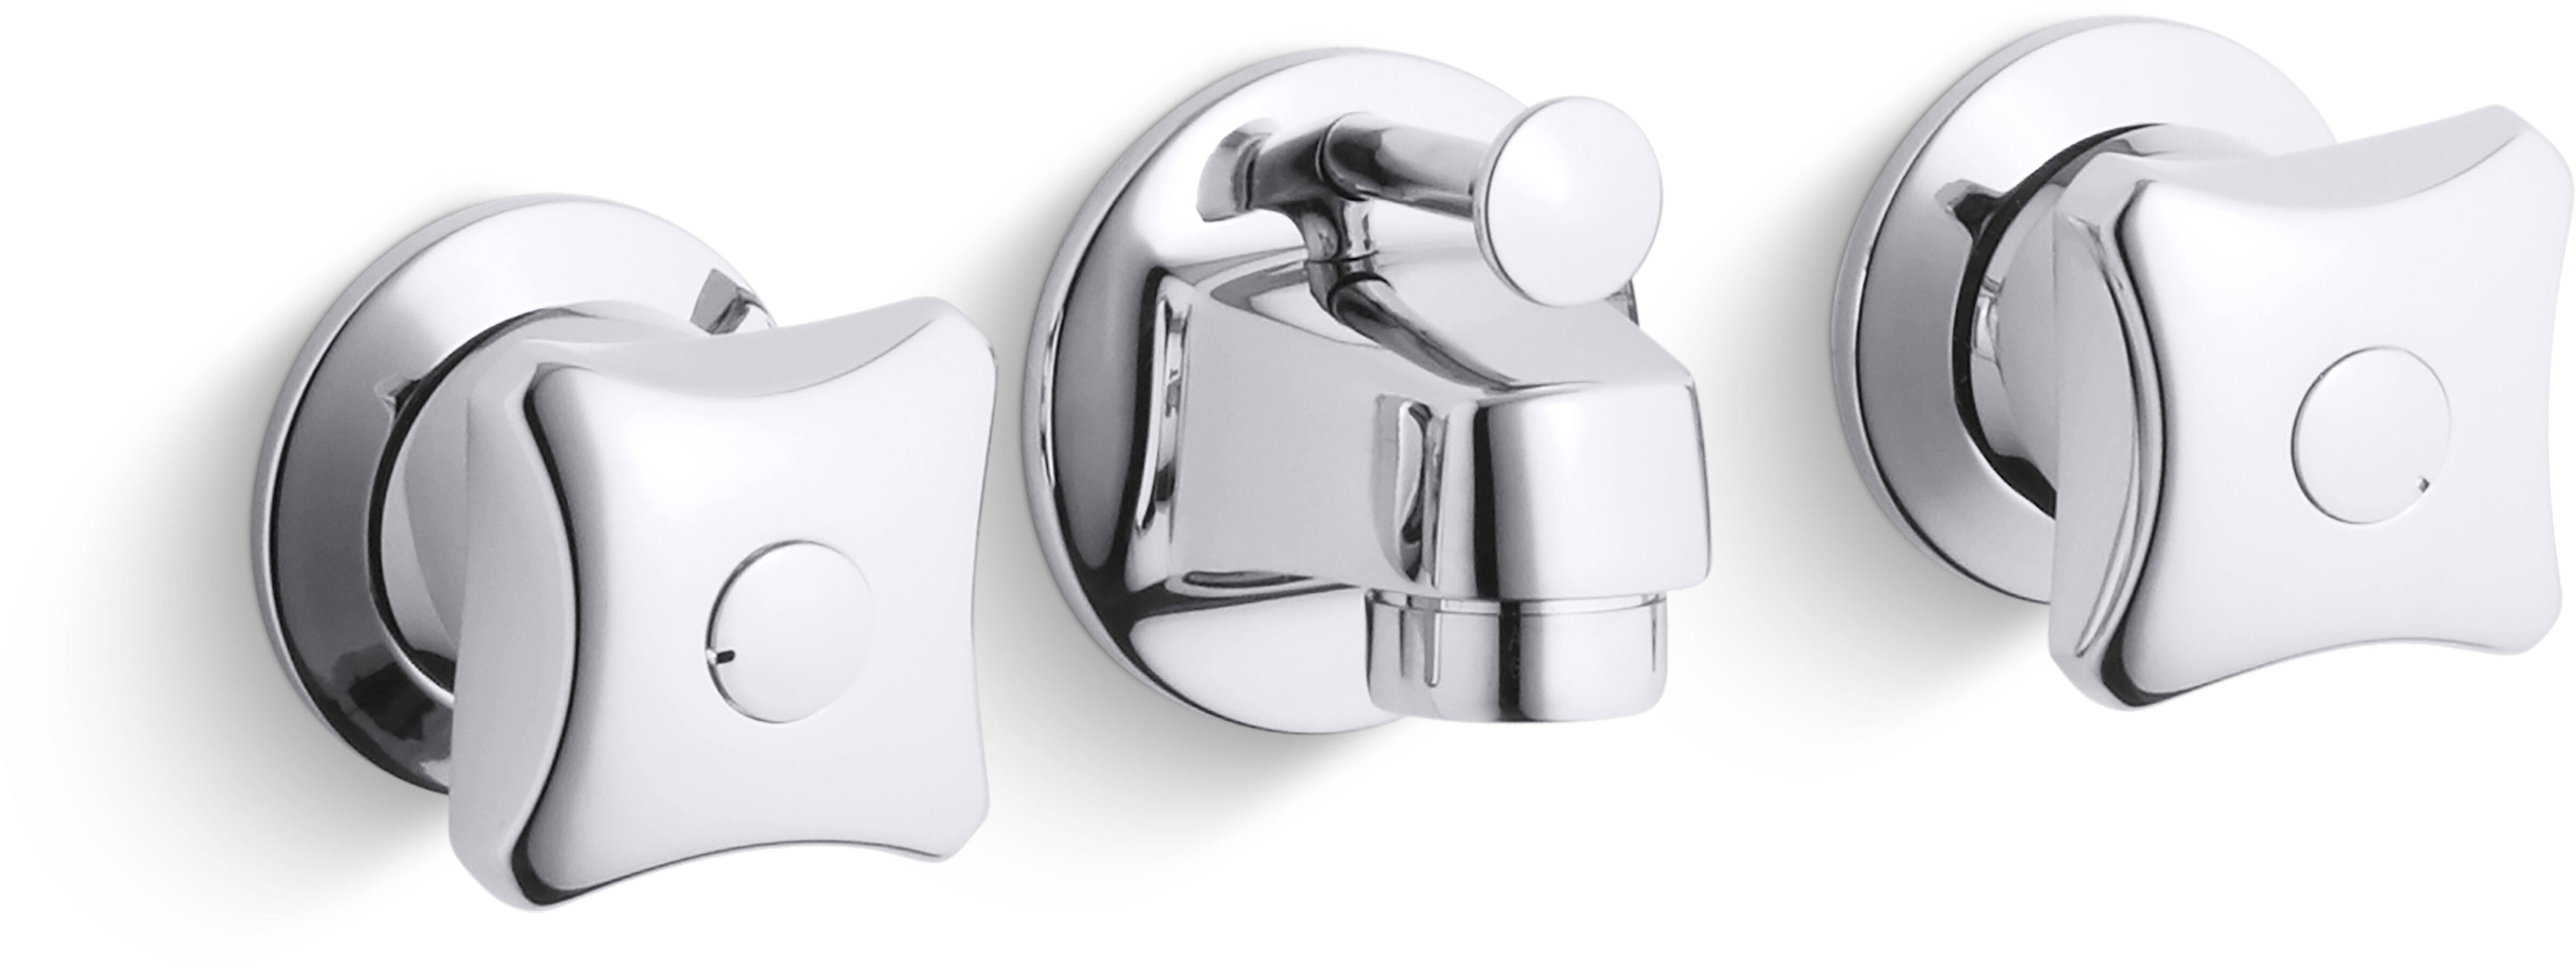 Kohler Triton 0 5 Gpm Shelf Back Commercial Bathroom Sink Faucet With Pop Up Drain And Standard Handles Wayfair